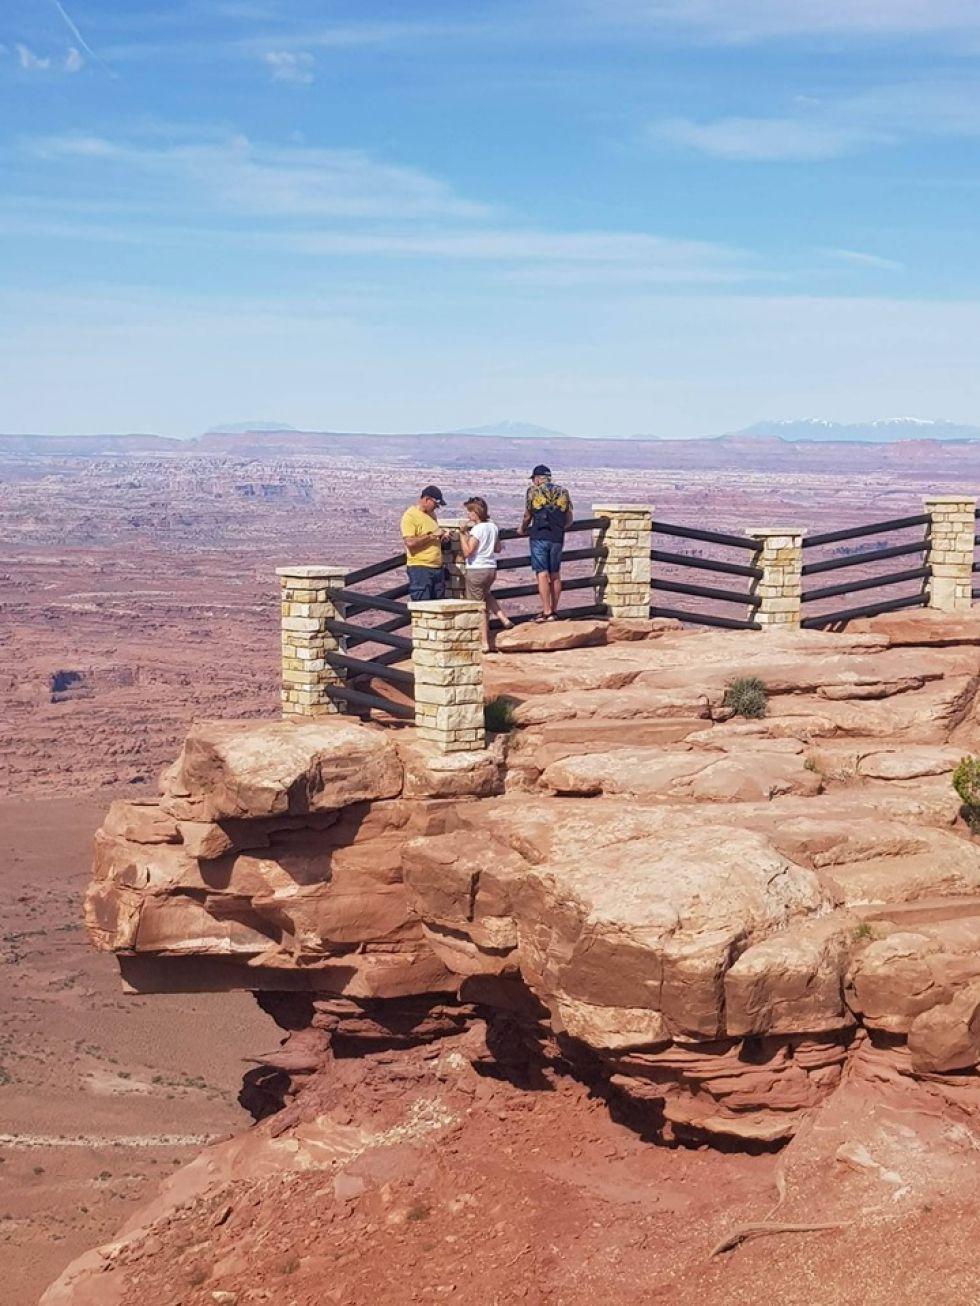 platforma widokowa na gory skaliste